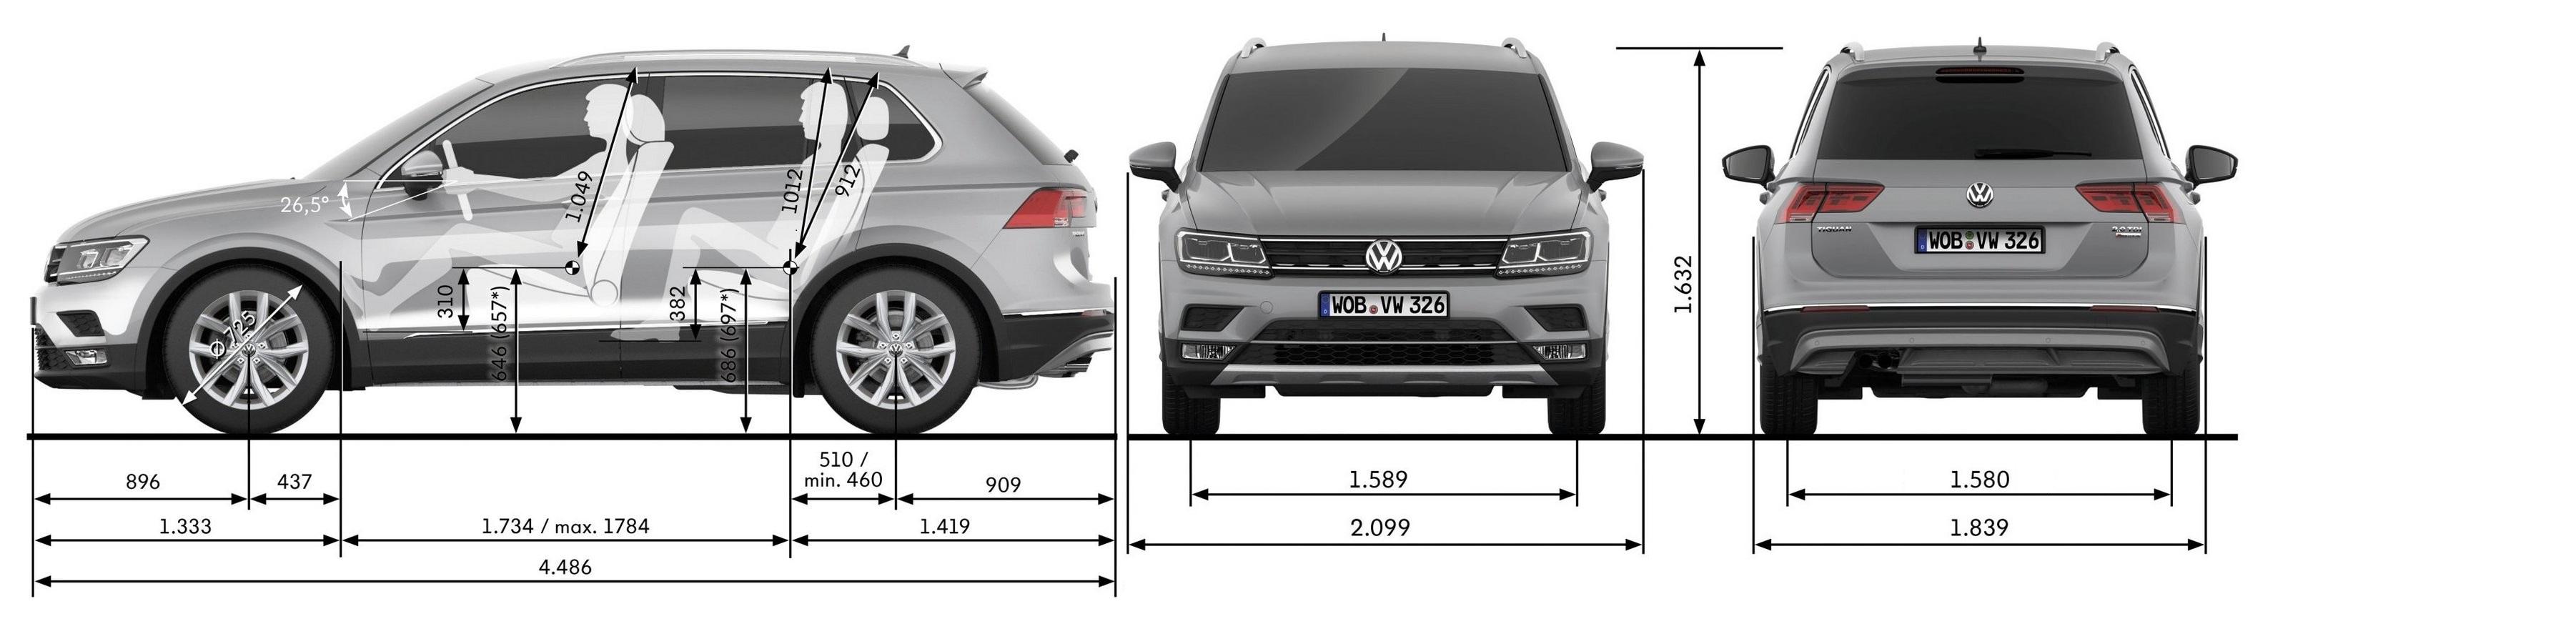 Volkswagen Tiguan 2 www.autoportal.pro 0